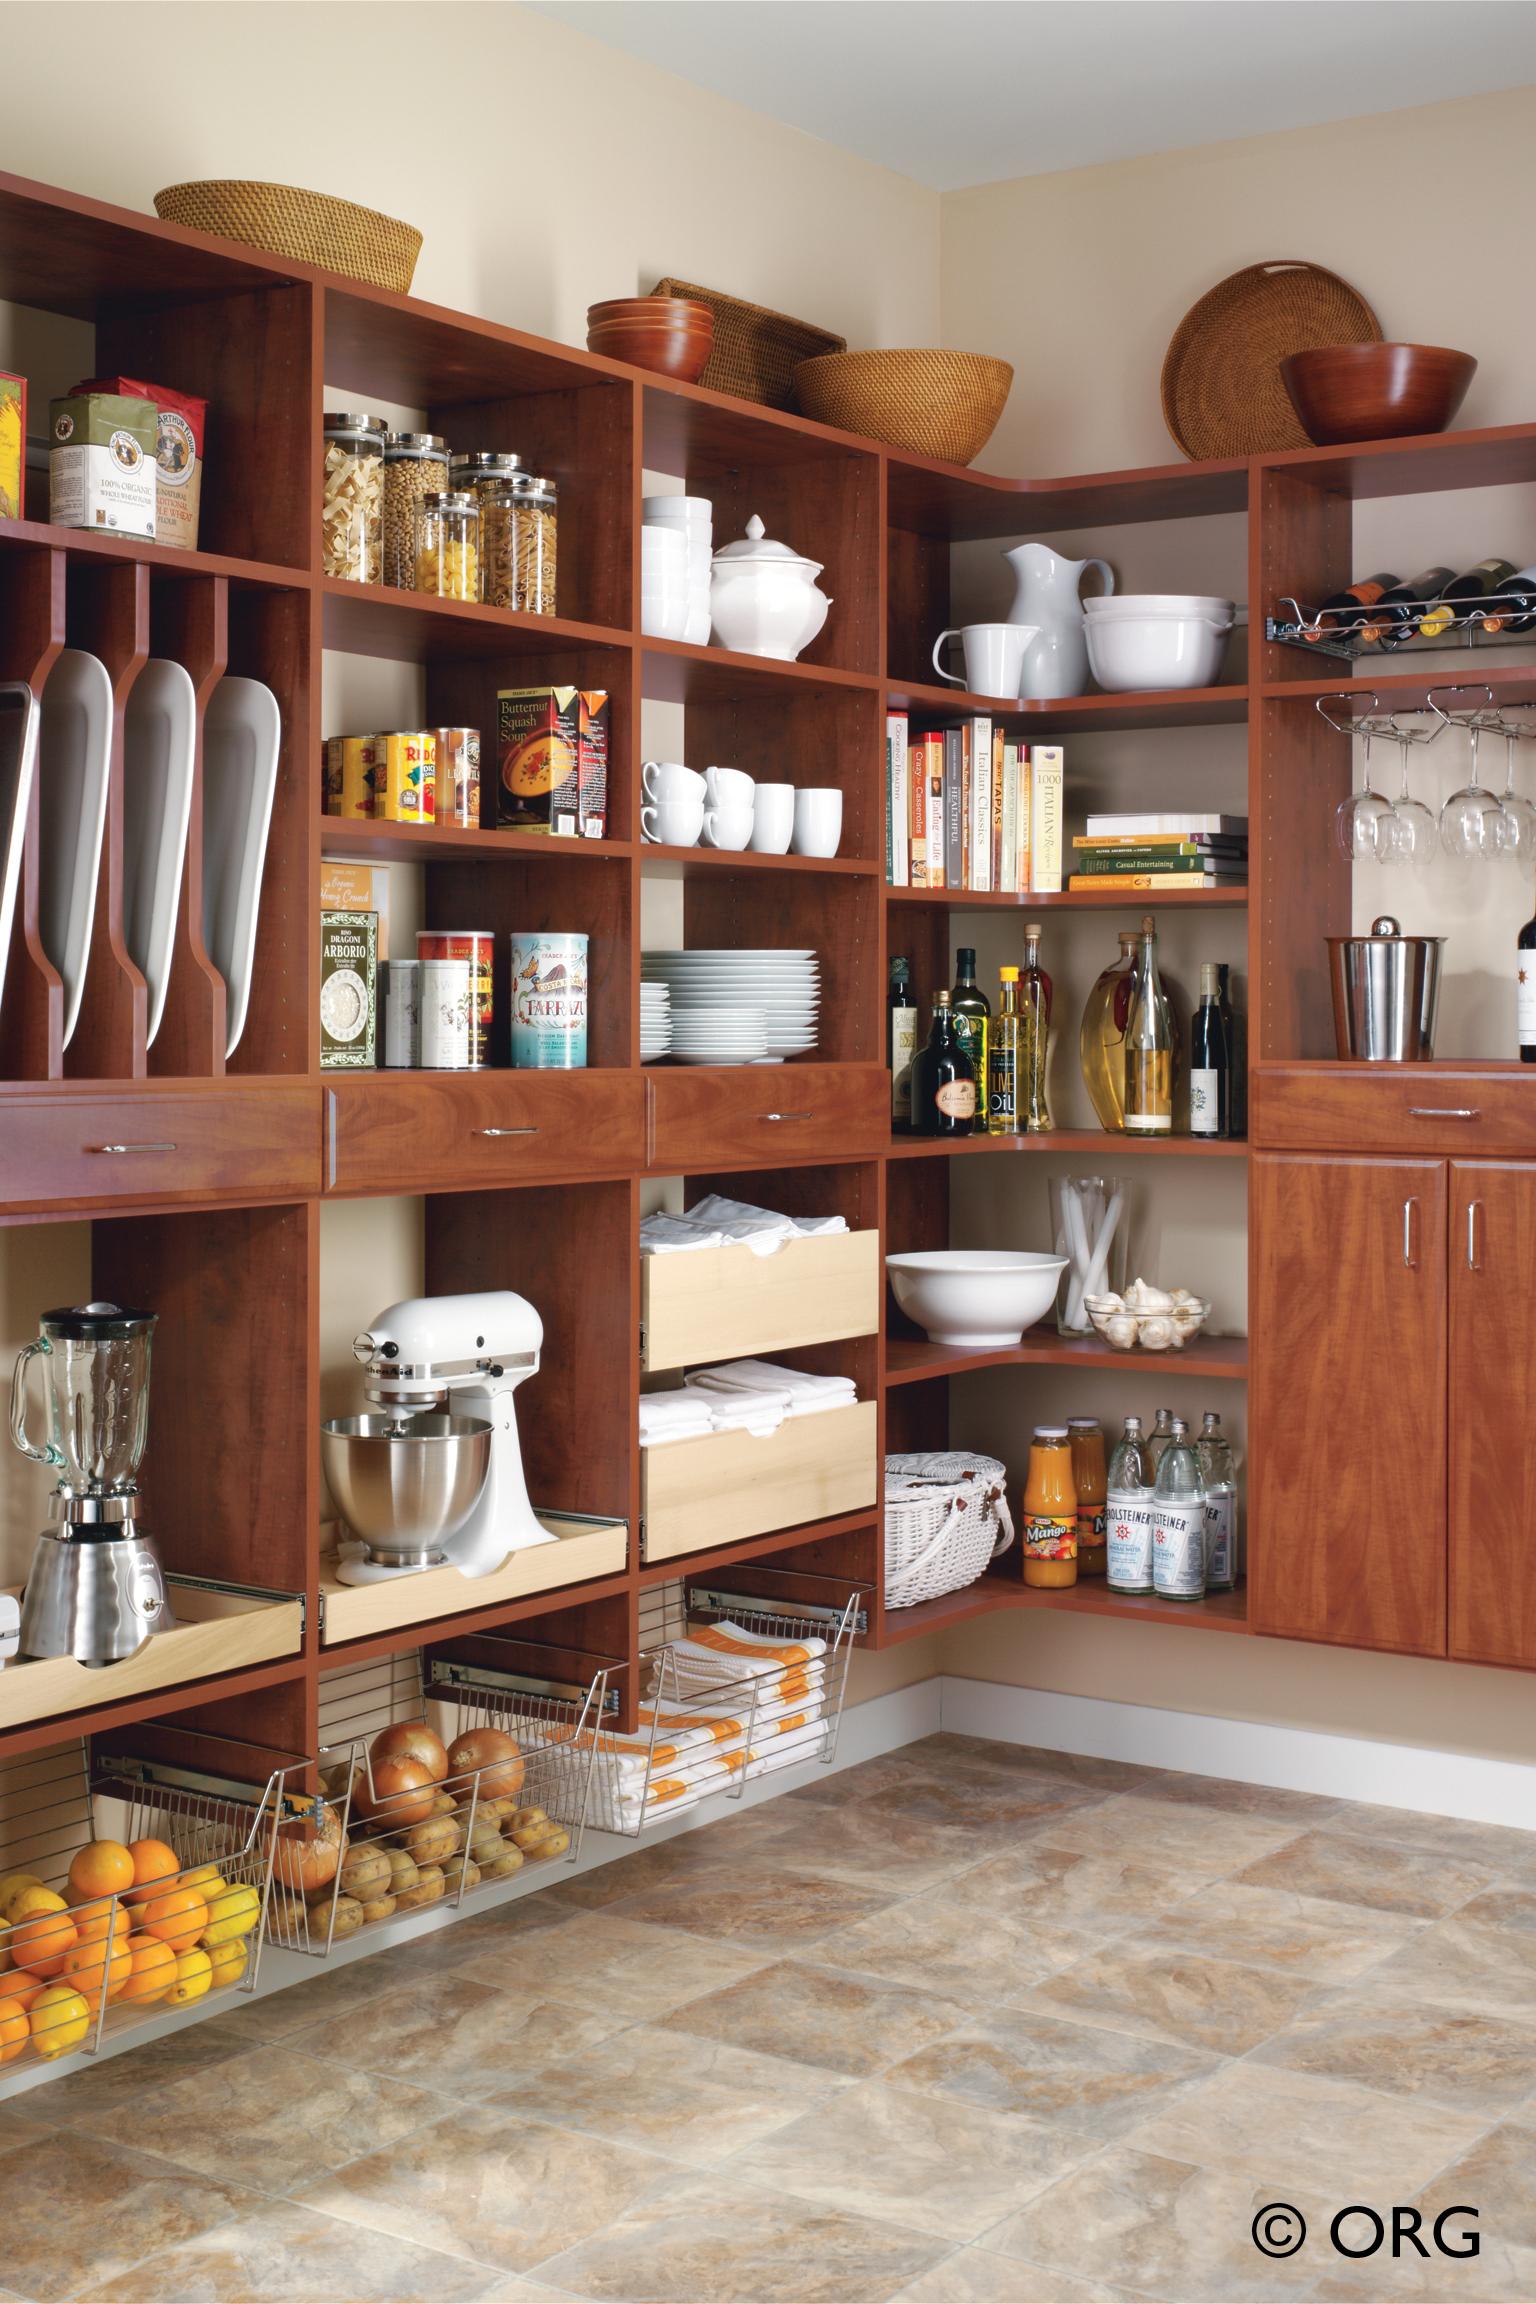 kitchen-pantry-storage-831.jpg